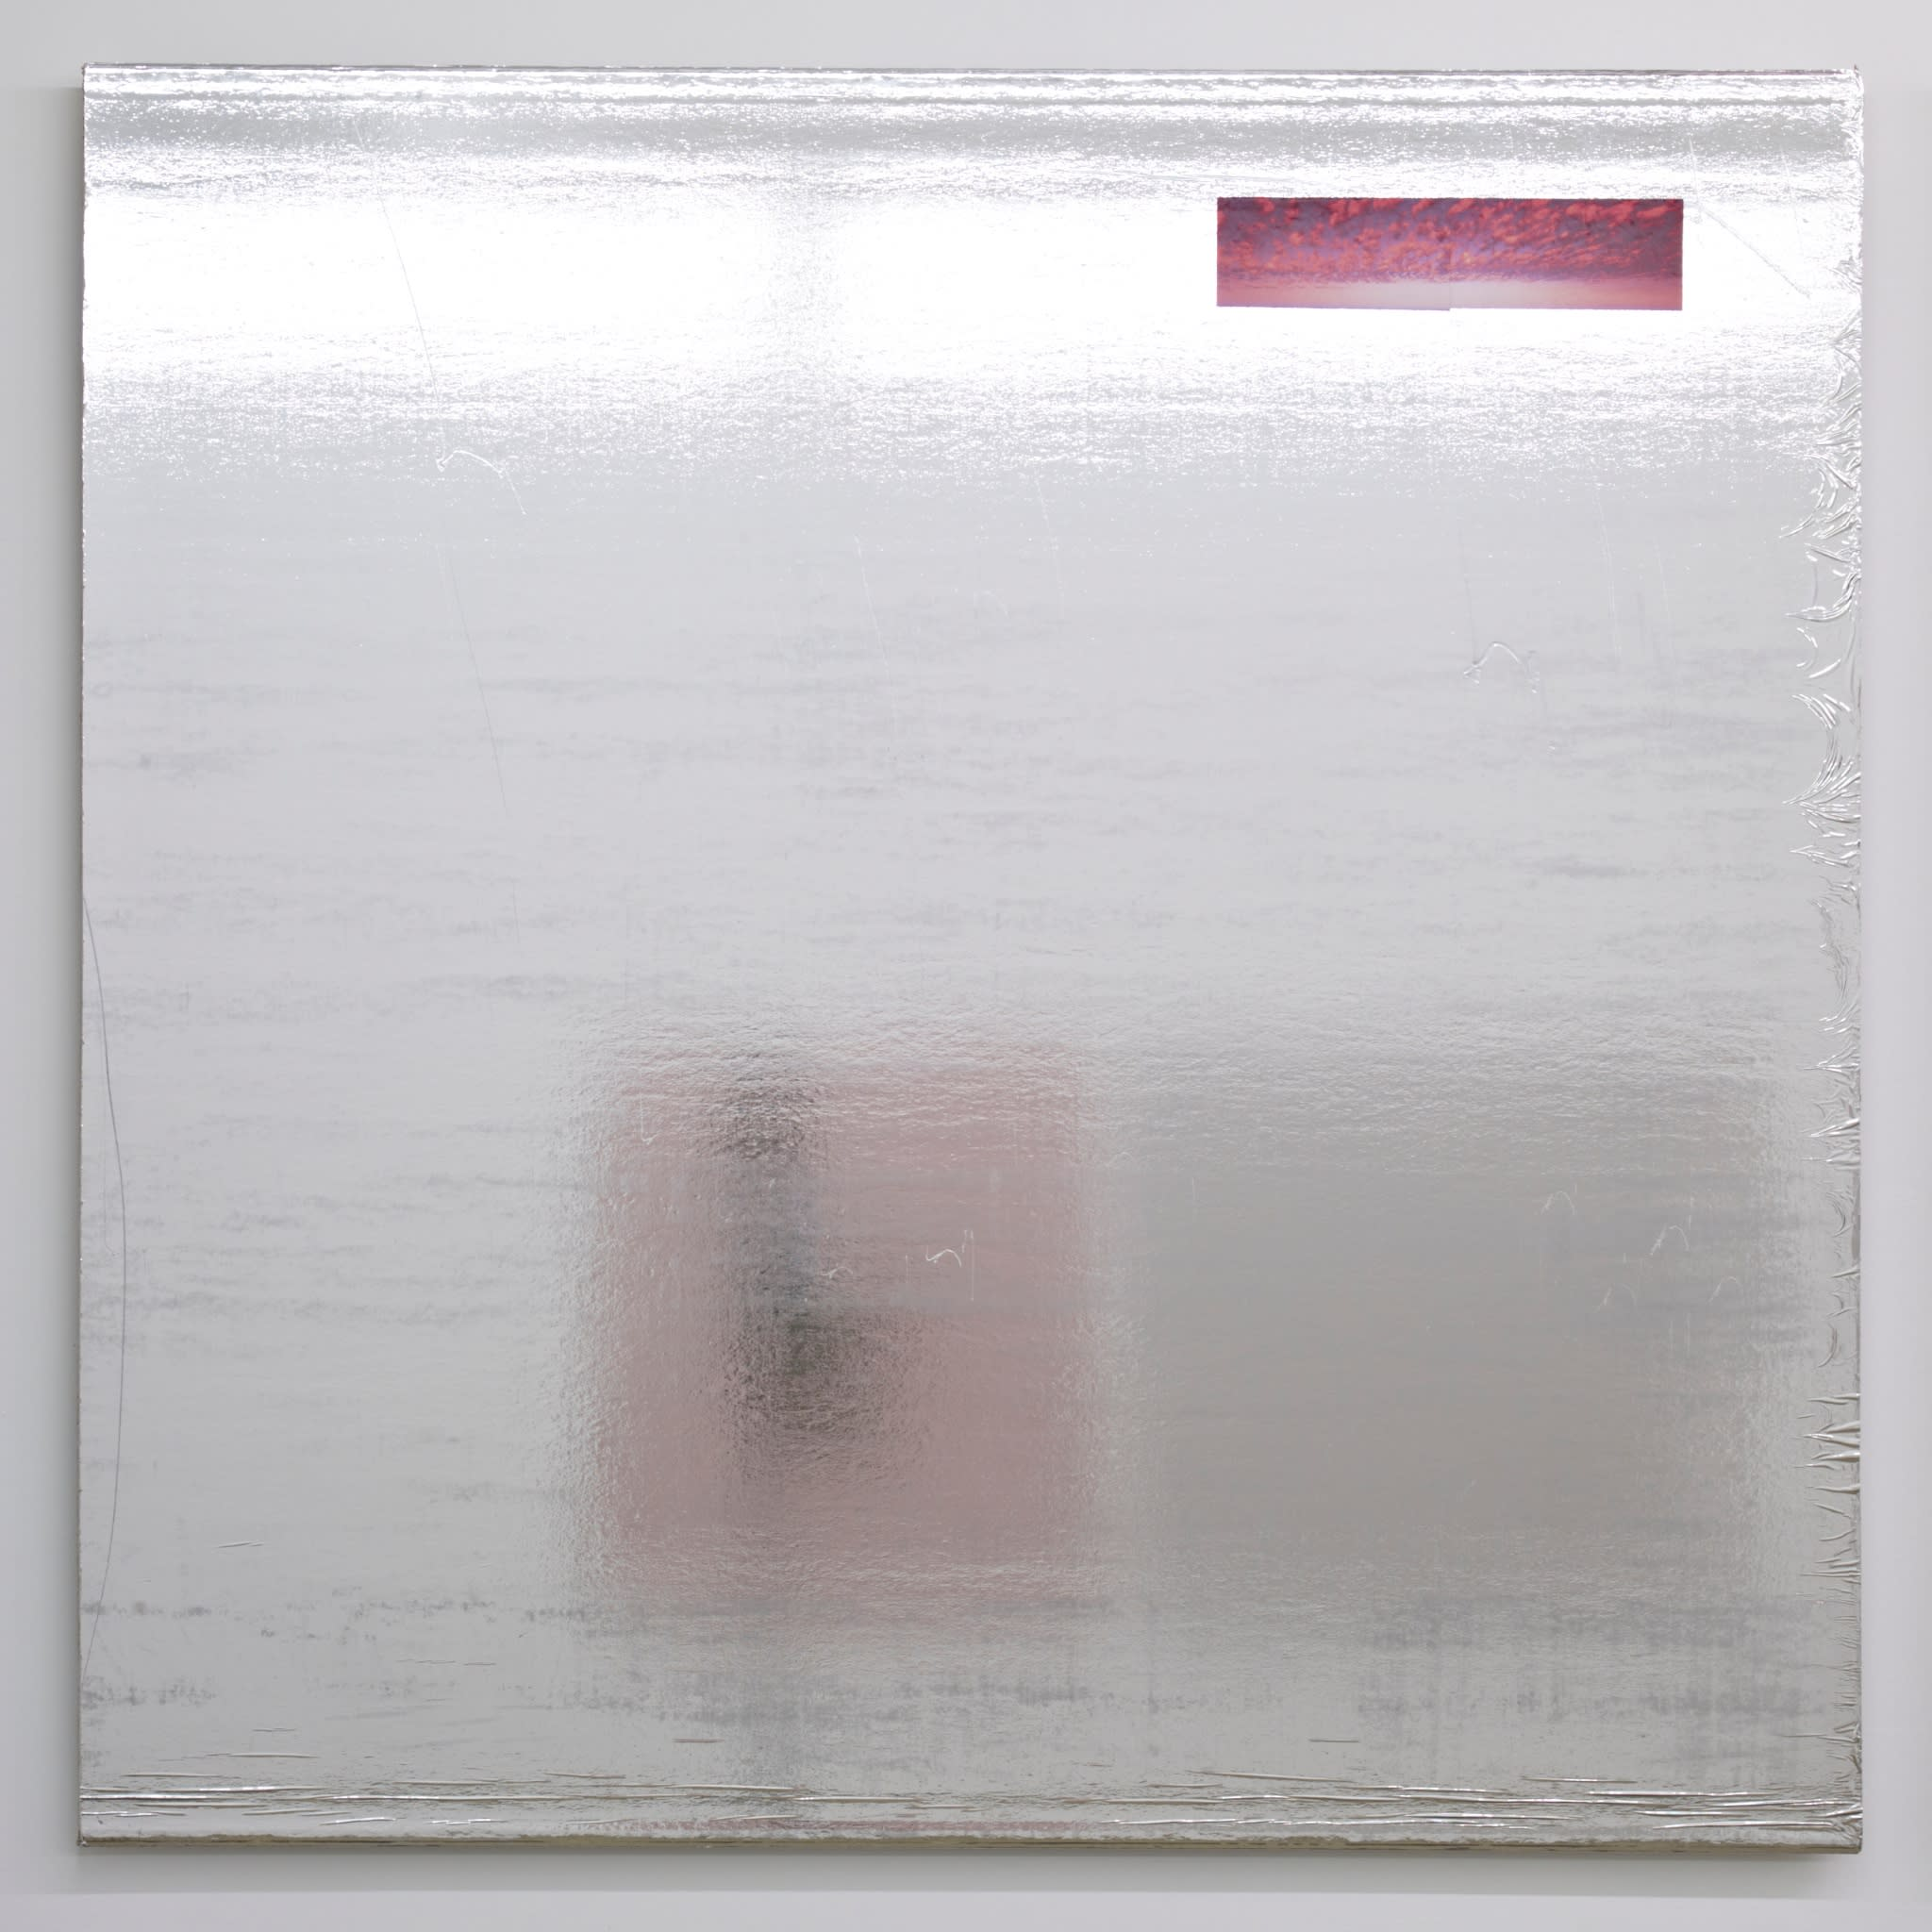 <span class=&#34;link fancybox-details-link&#34;><a href=&#34;/artists/16-paul-merrick/works/8428/&#34;>View Detail Page</a></span><div class=&#34;artist&#34;><strong>Paul Merrick</strong></div> <div class=&#34;title&#34;><em>Untitled (Key Largo)</em>, 2014</div> <div class=&#34;medium&#34;>Baseboard, found images</div> <div class=&#34;dimensions&#34;>120 x 120 cm<br />47 1/4 x 47 1/4 in</div><div class=&#34;copyright_line&#34;>Copyright The Artist</div>